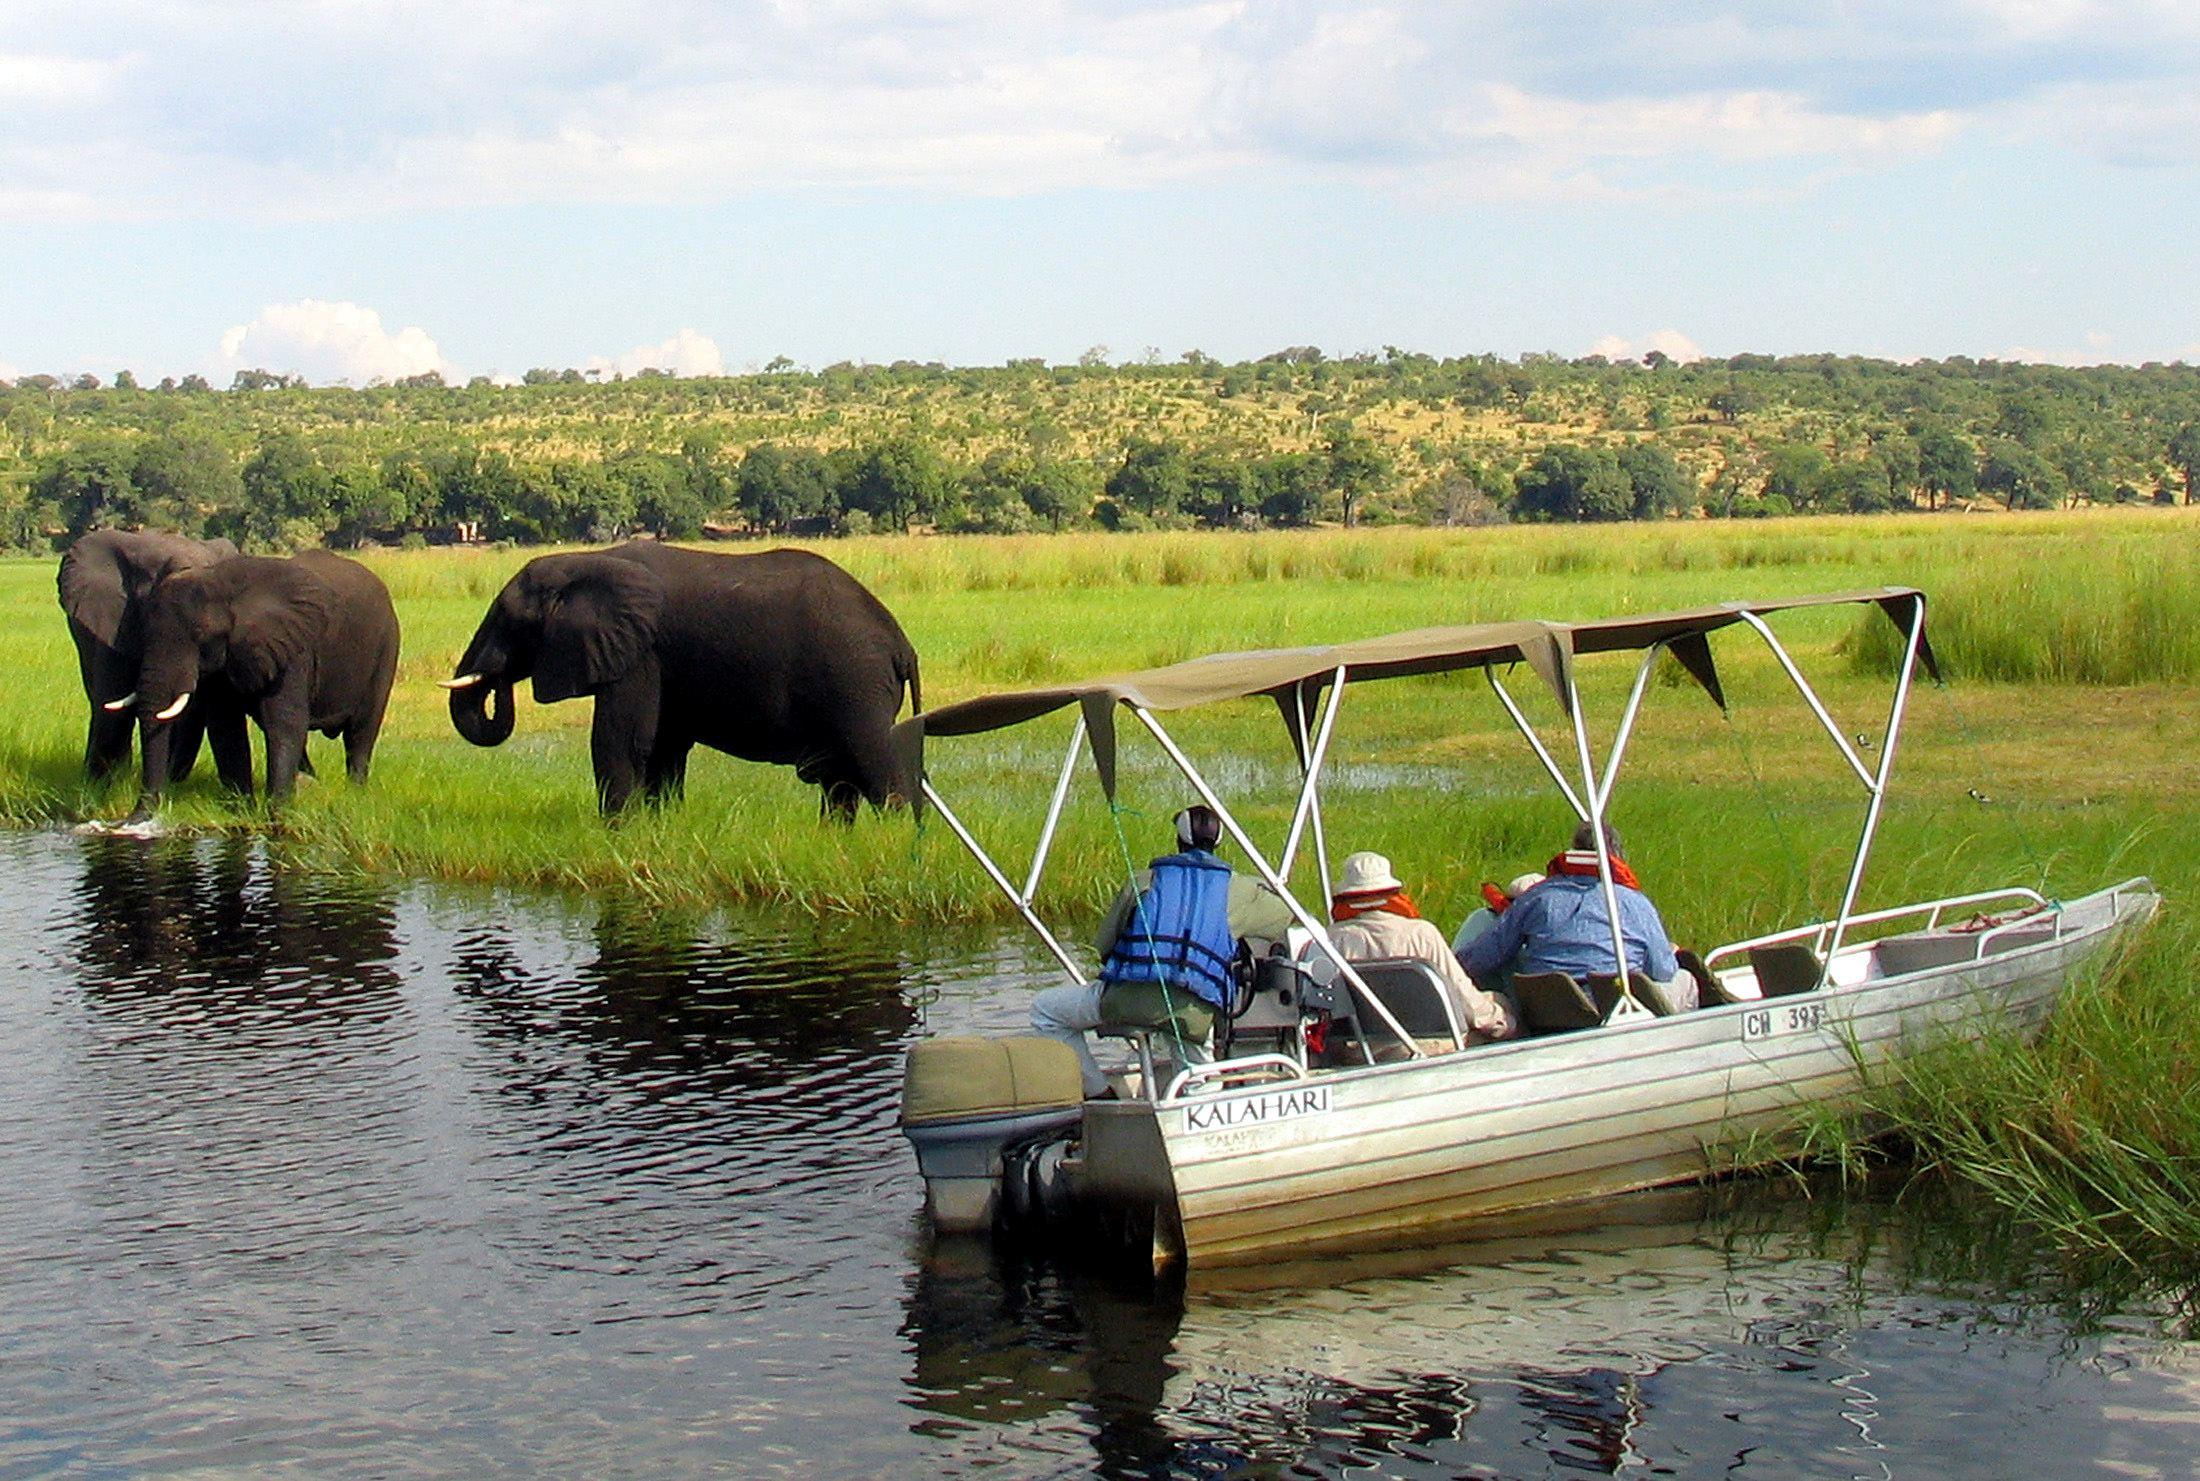 Foreign tourists observe elephants along the Chobe river bank near Botswana's northern border where Zimbabwe, Zambia and Namibia meet.